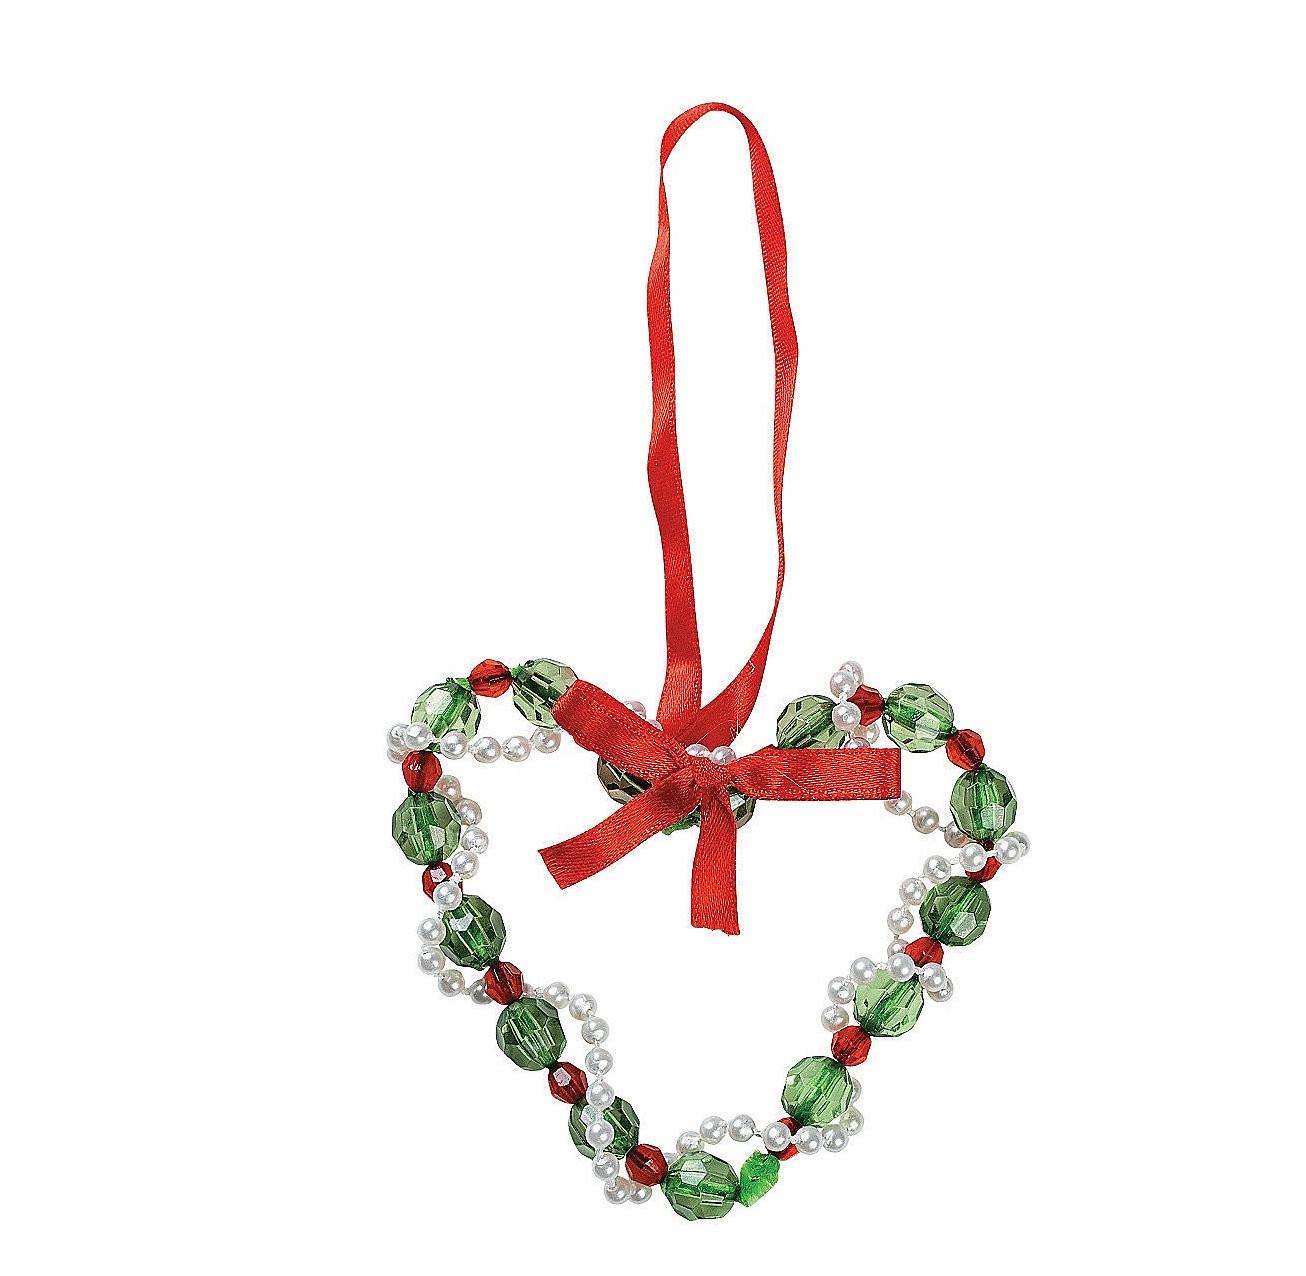 Mix Beads Heart Shaped Christmas Decor